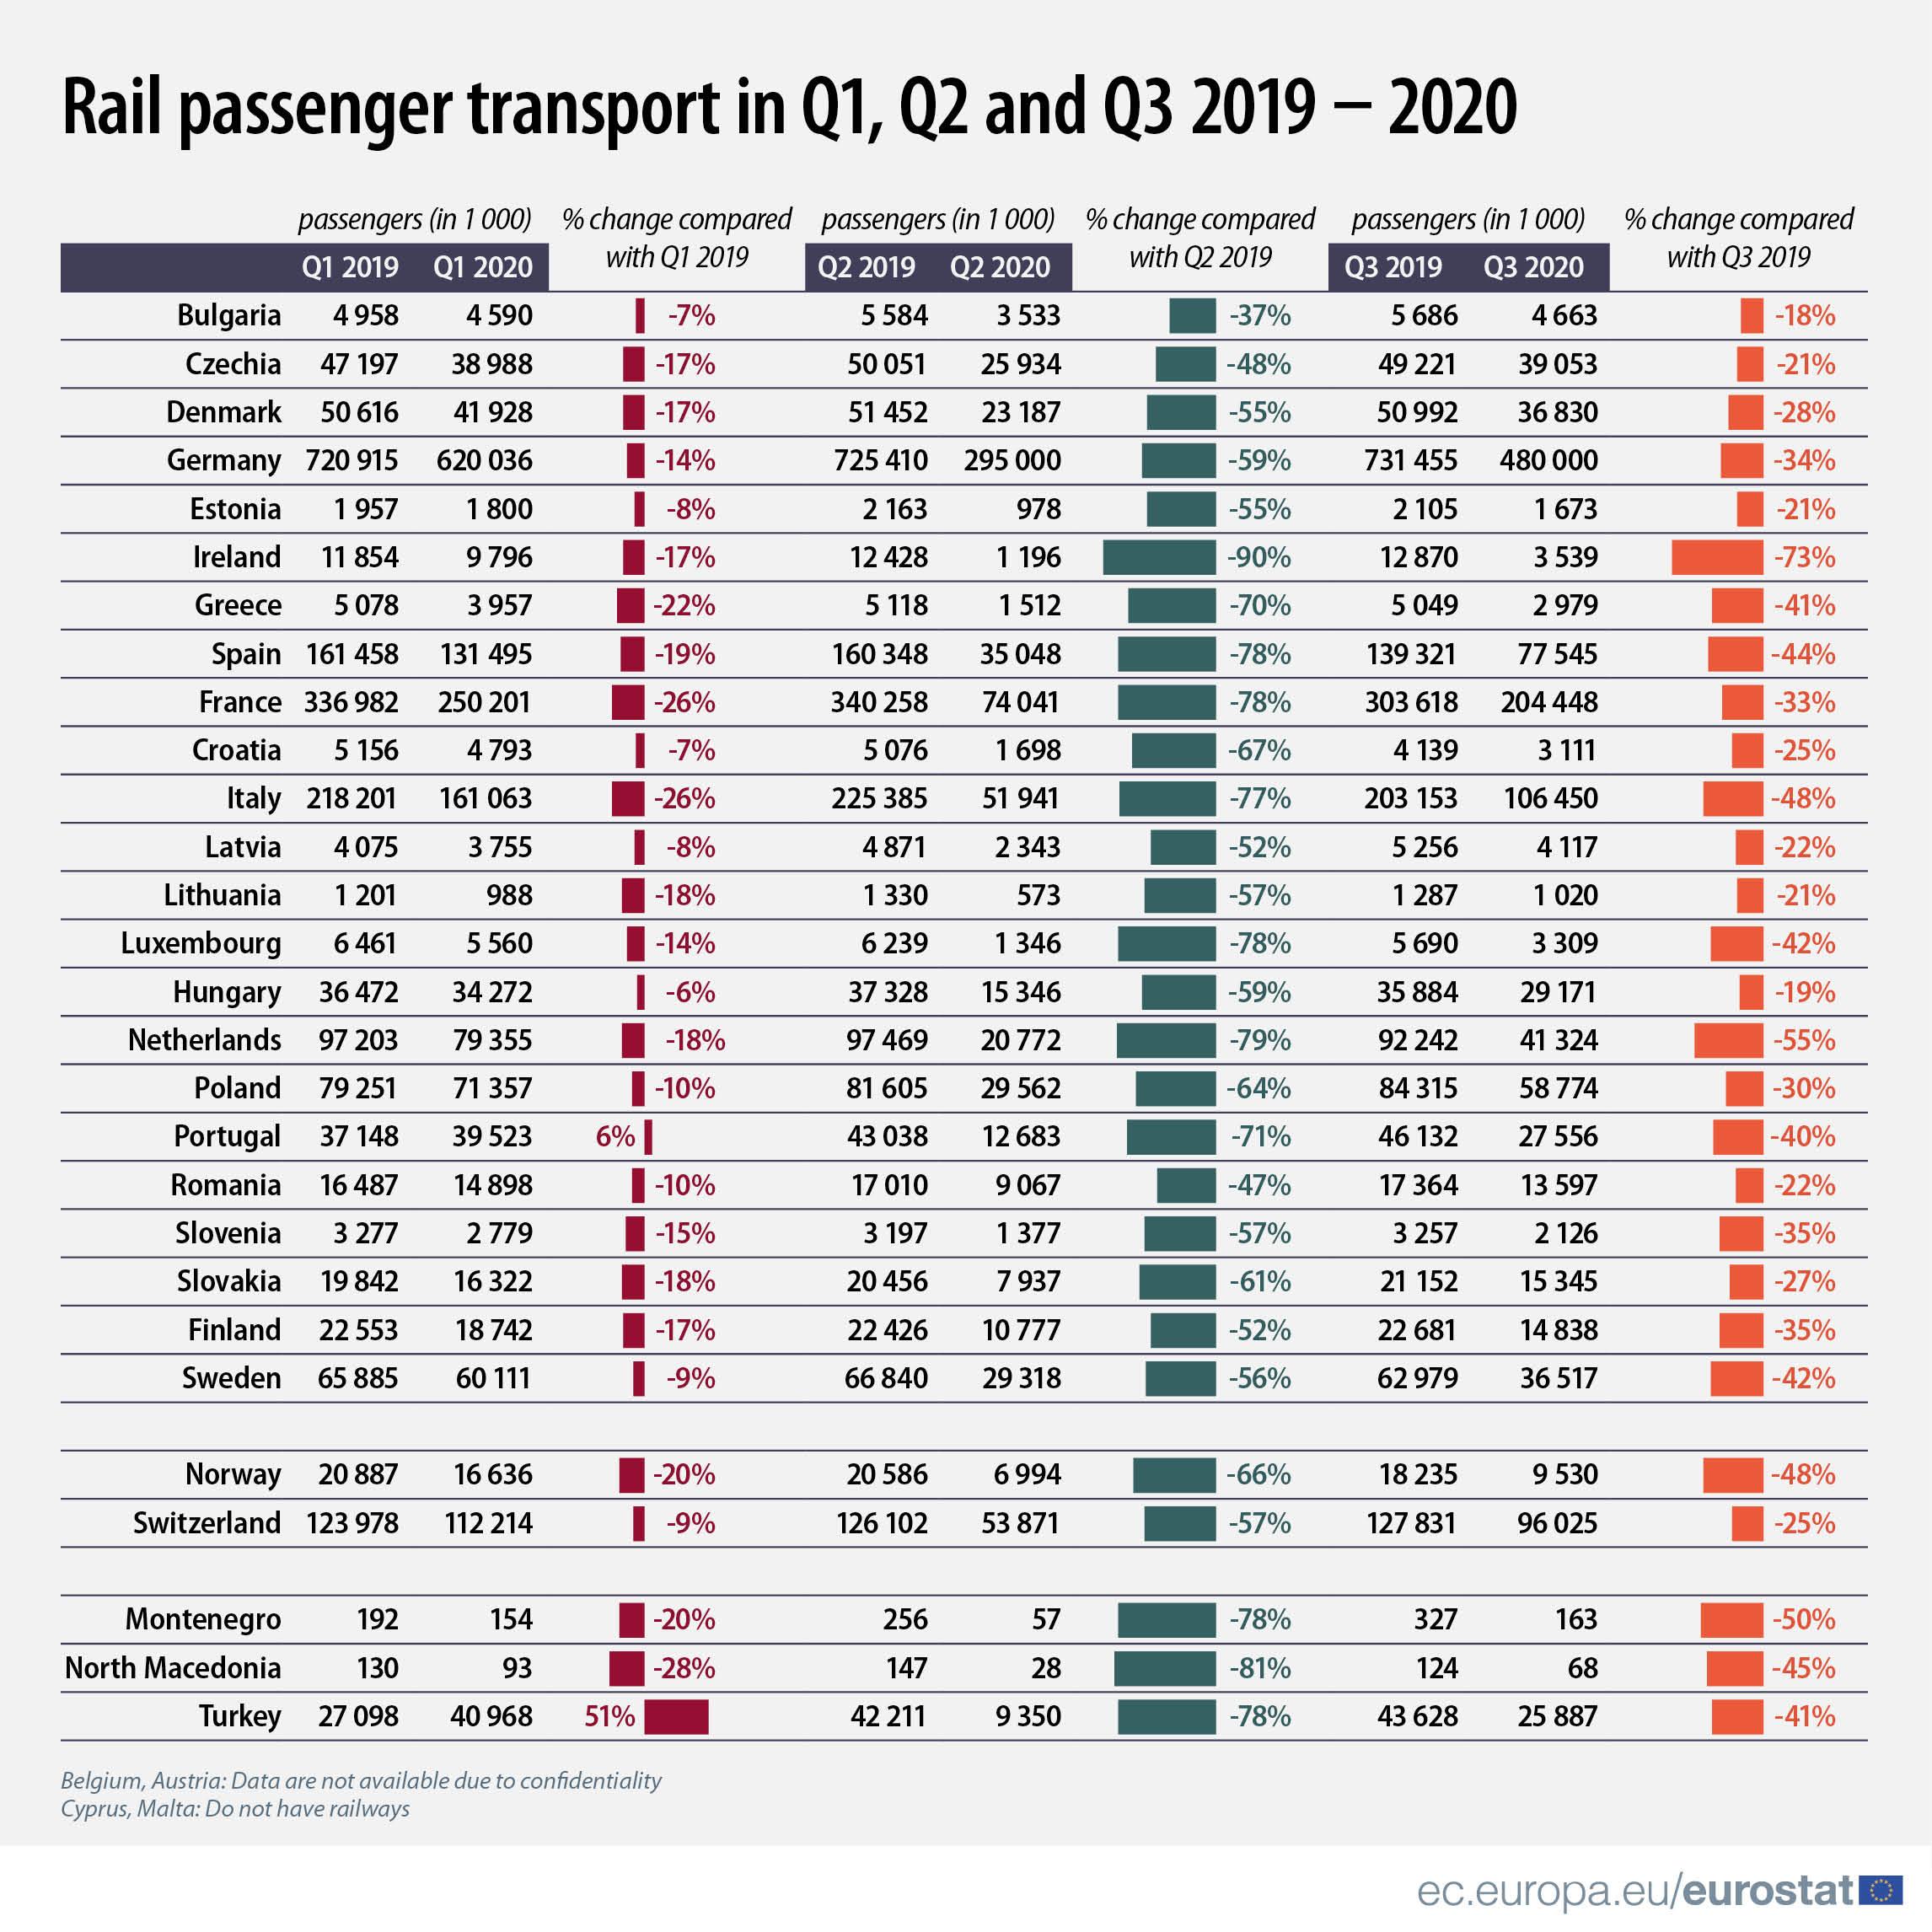 Rail passenger transport in Q1, Q2 and Q3 2019 - 2020